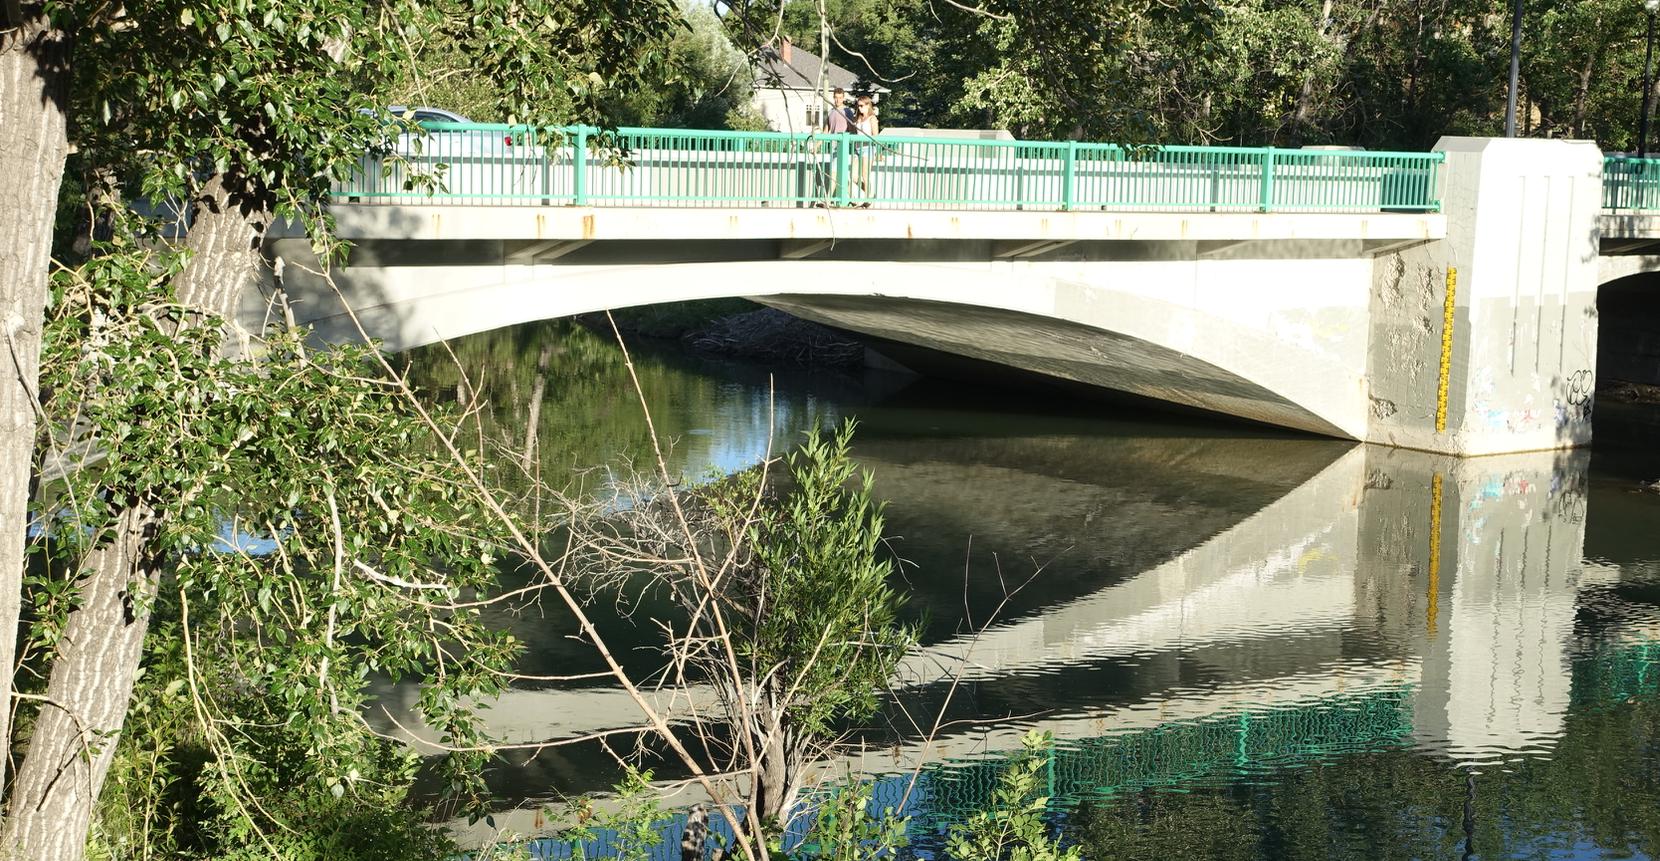 Mission bridge (1915) over the Elbow River